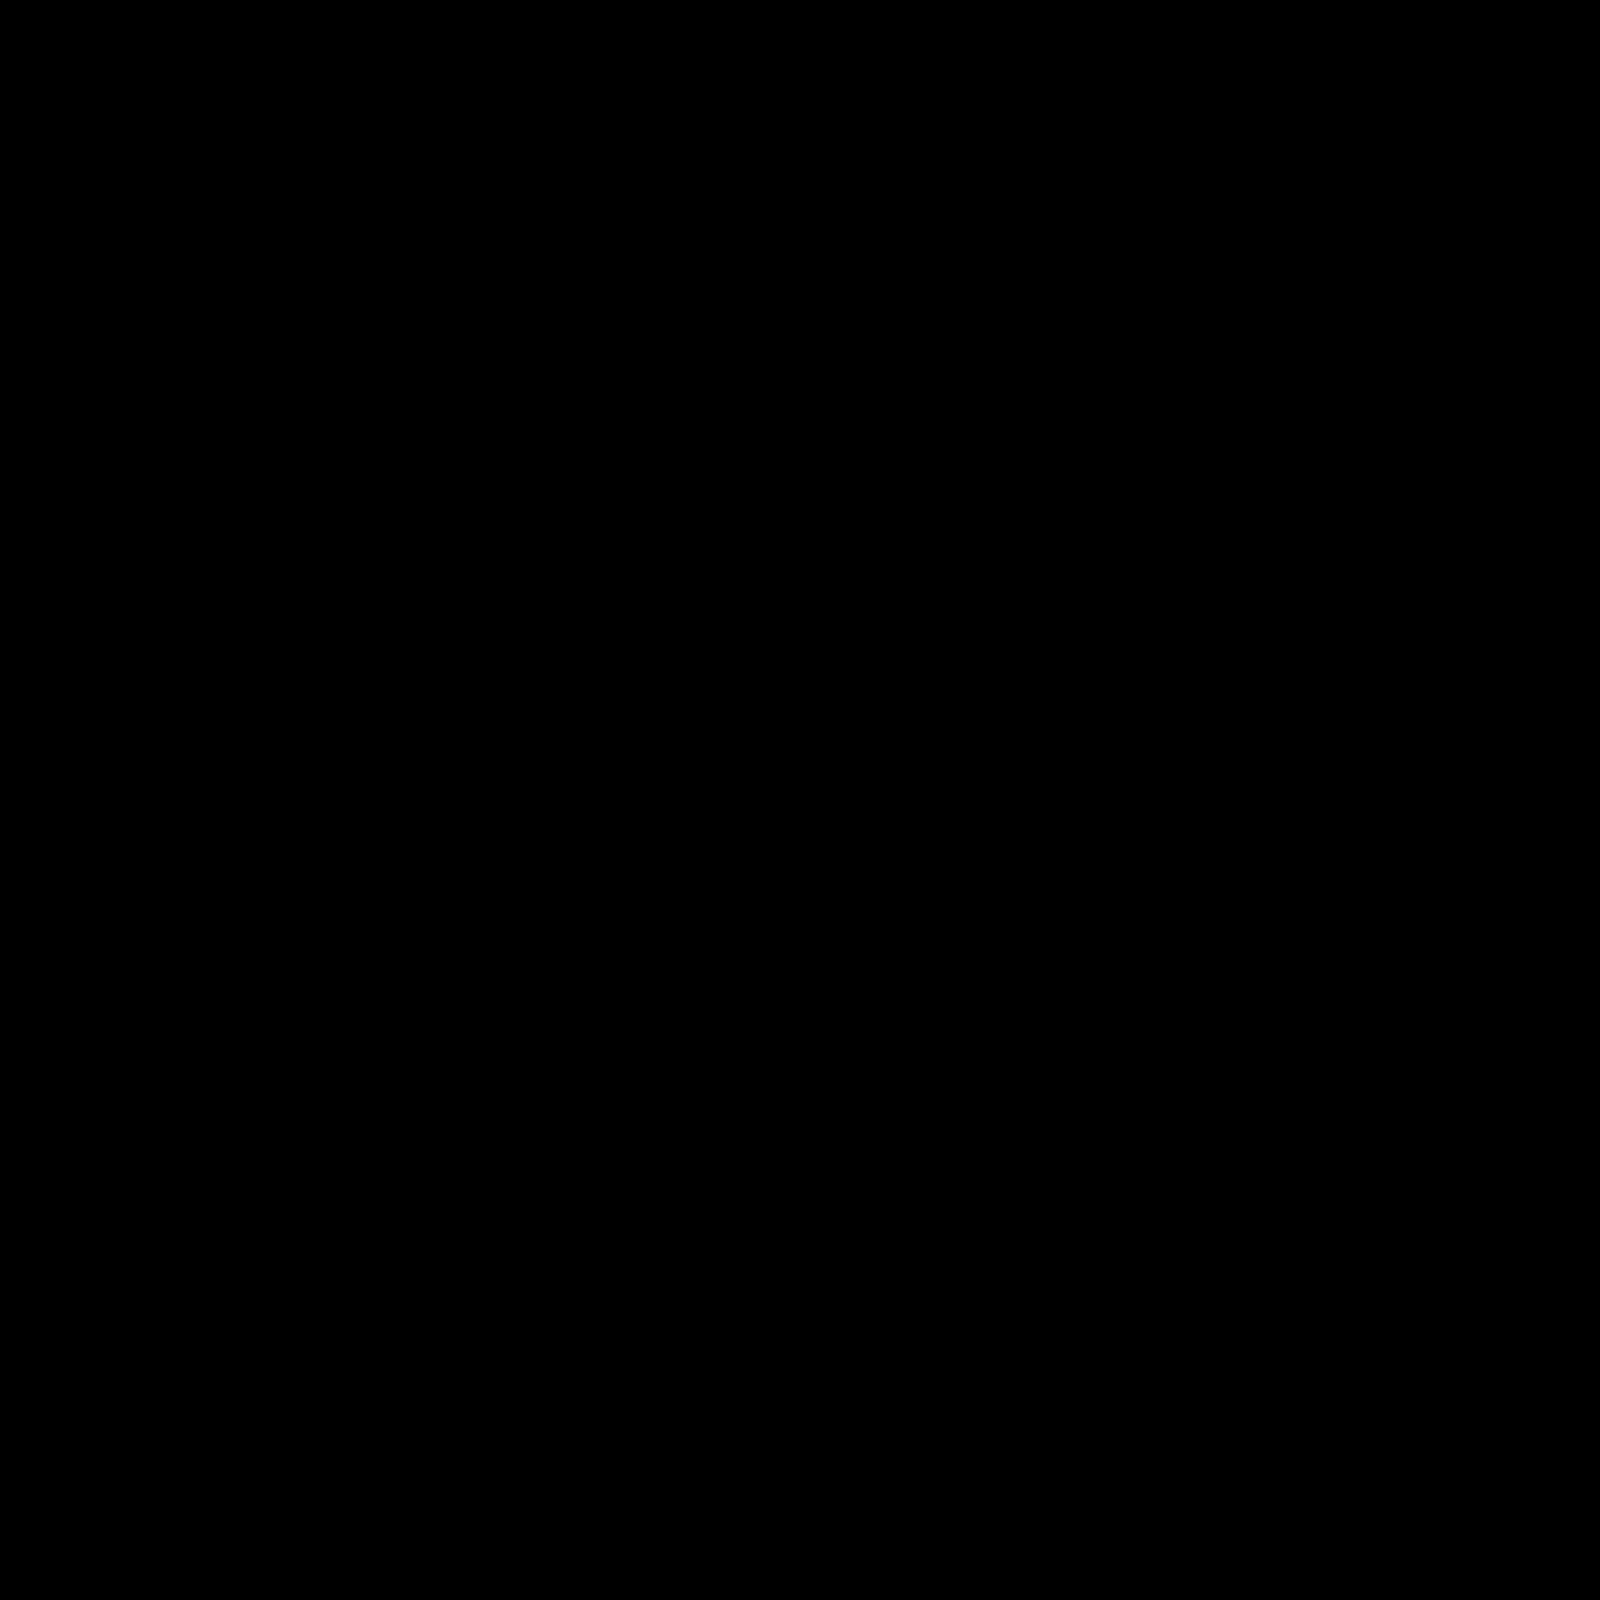 National Football League icon